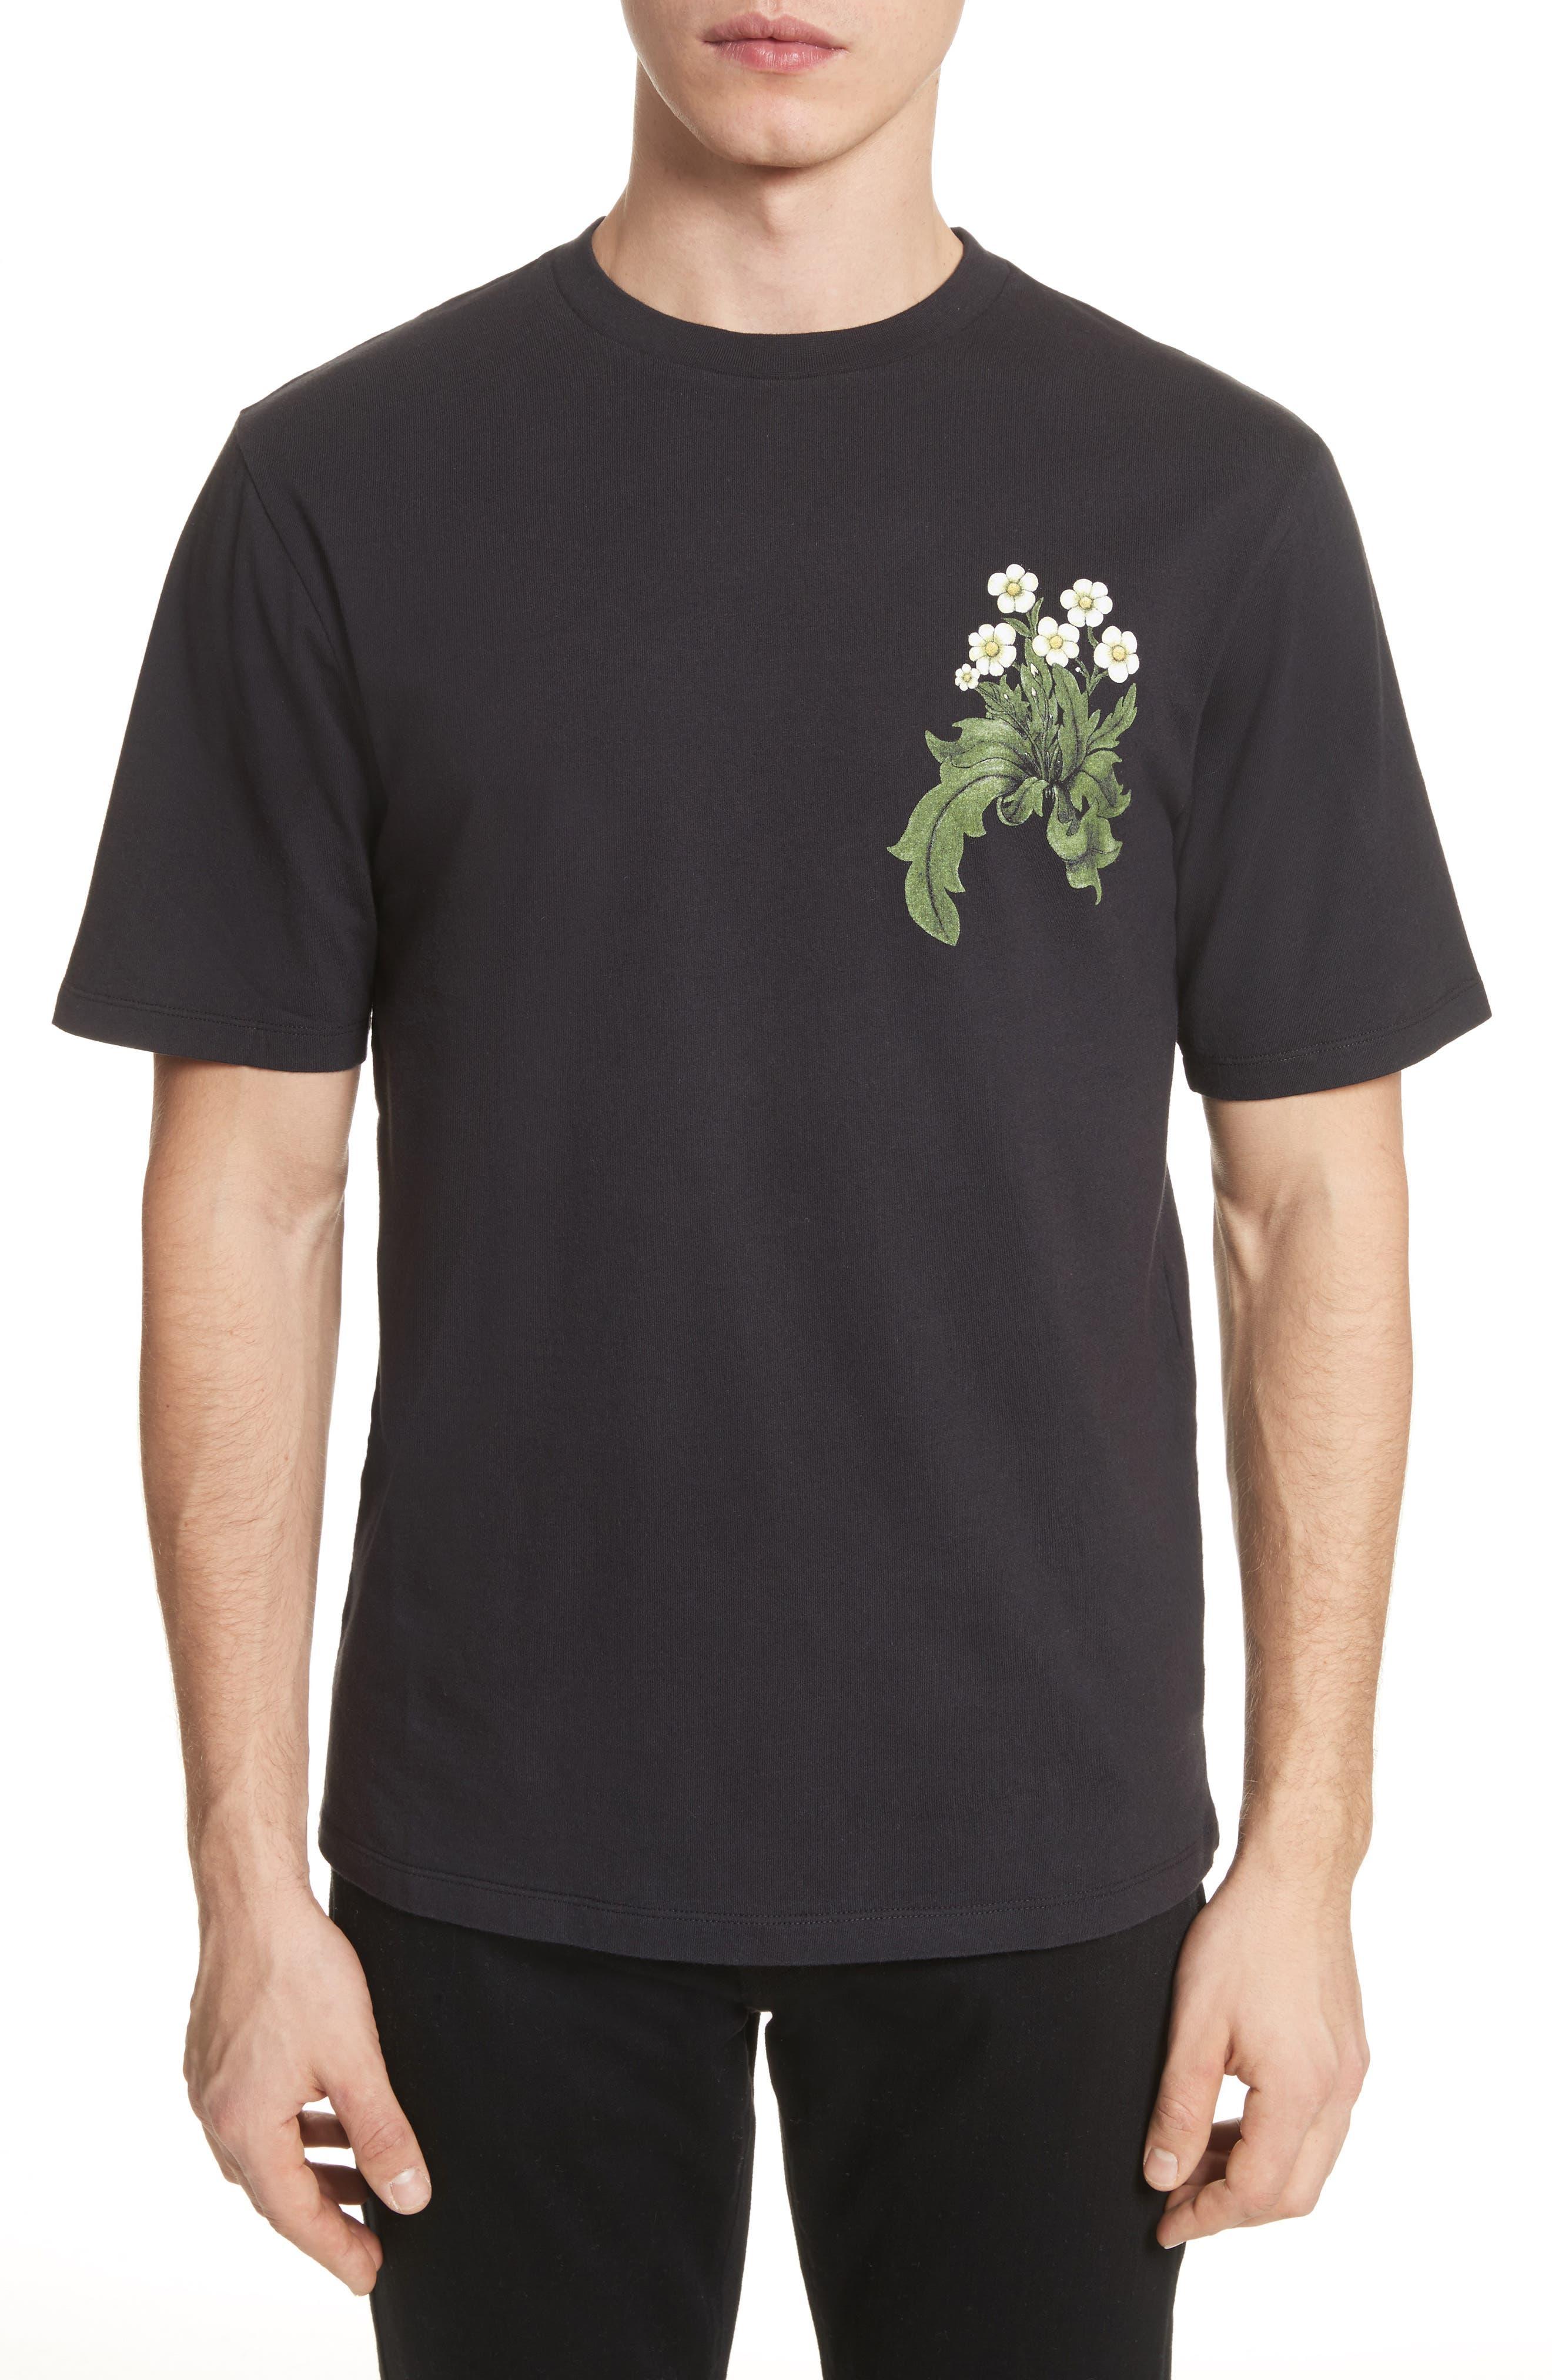 Main Image - Loewe Loewe & Co. Graphic T-Shirt